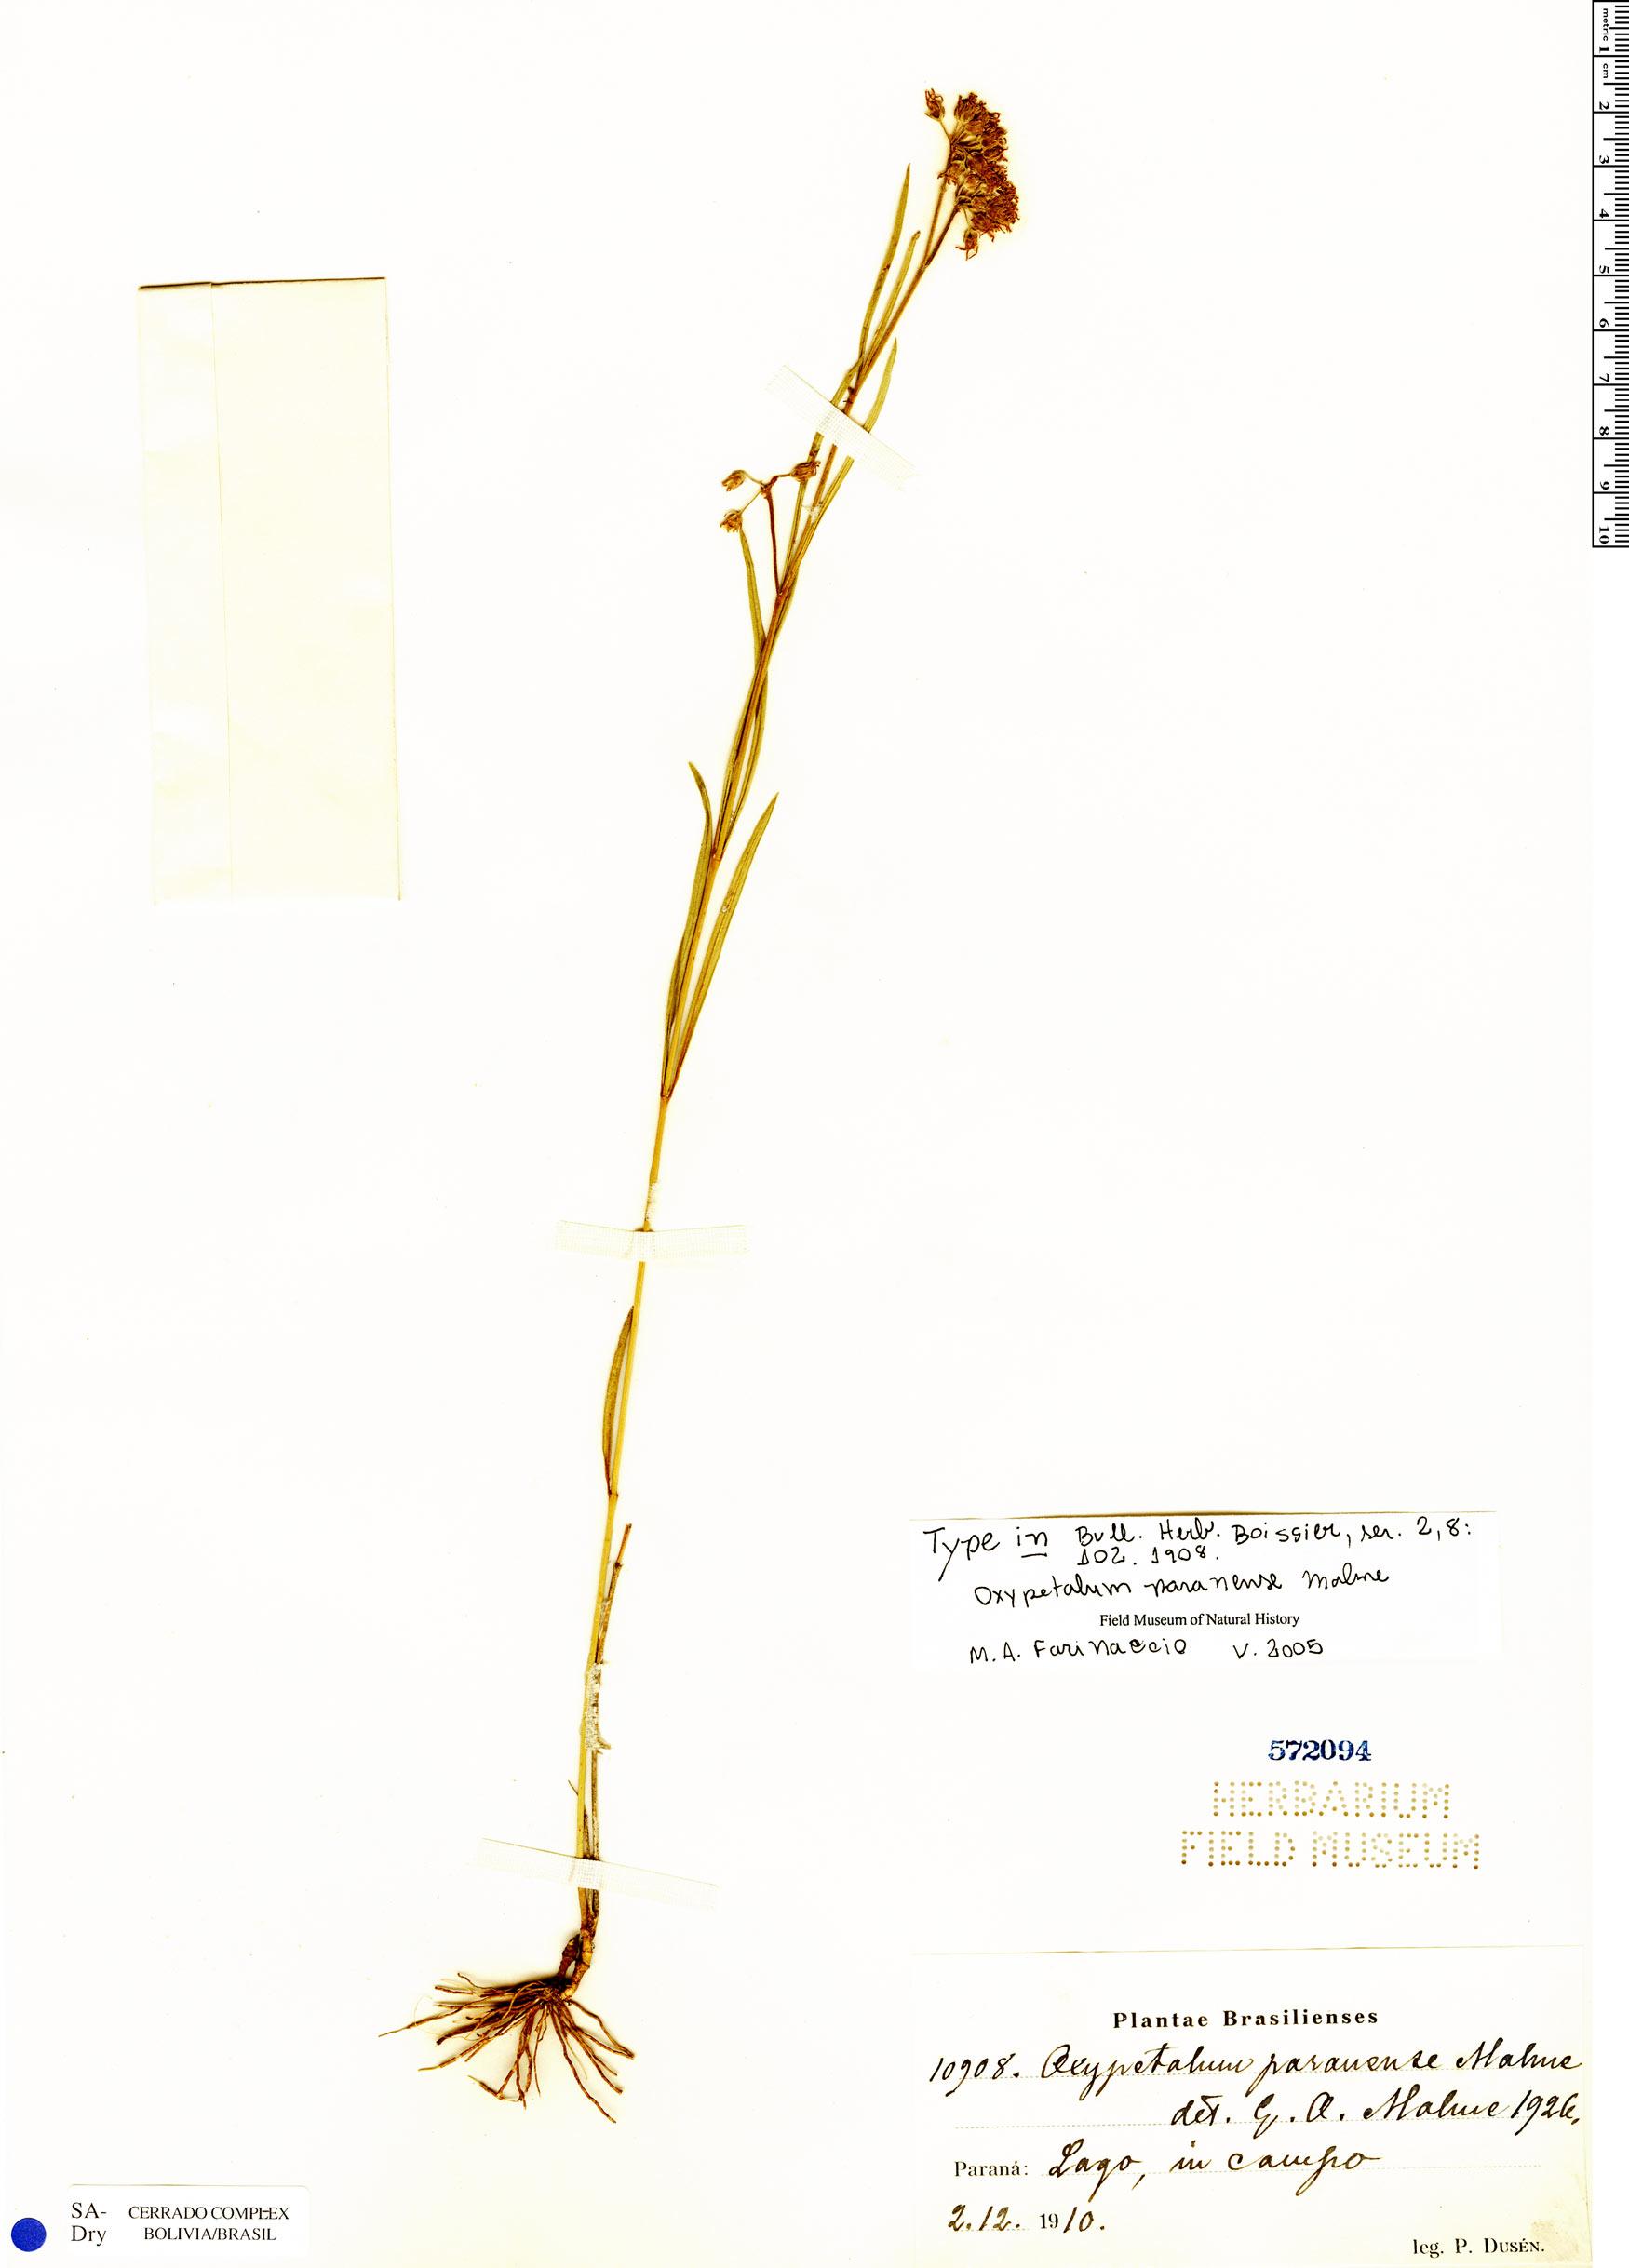 Specimen: Oxypetalum paranense